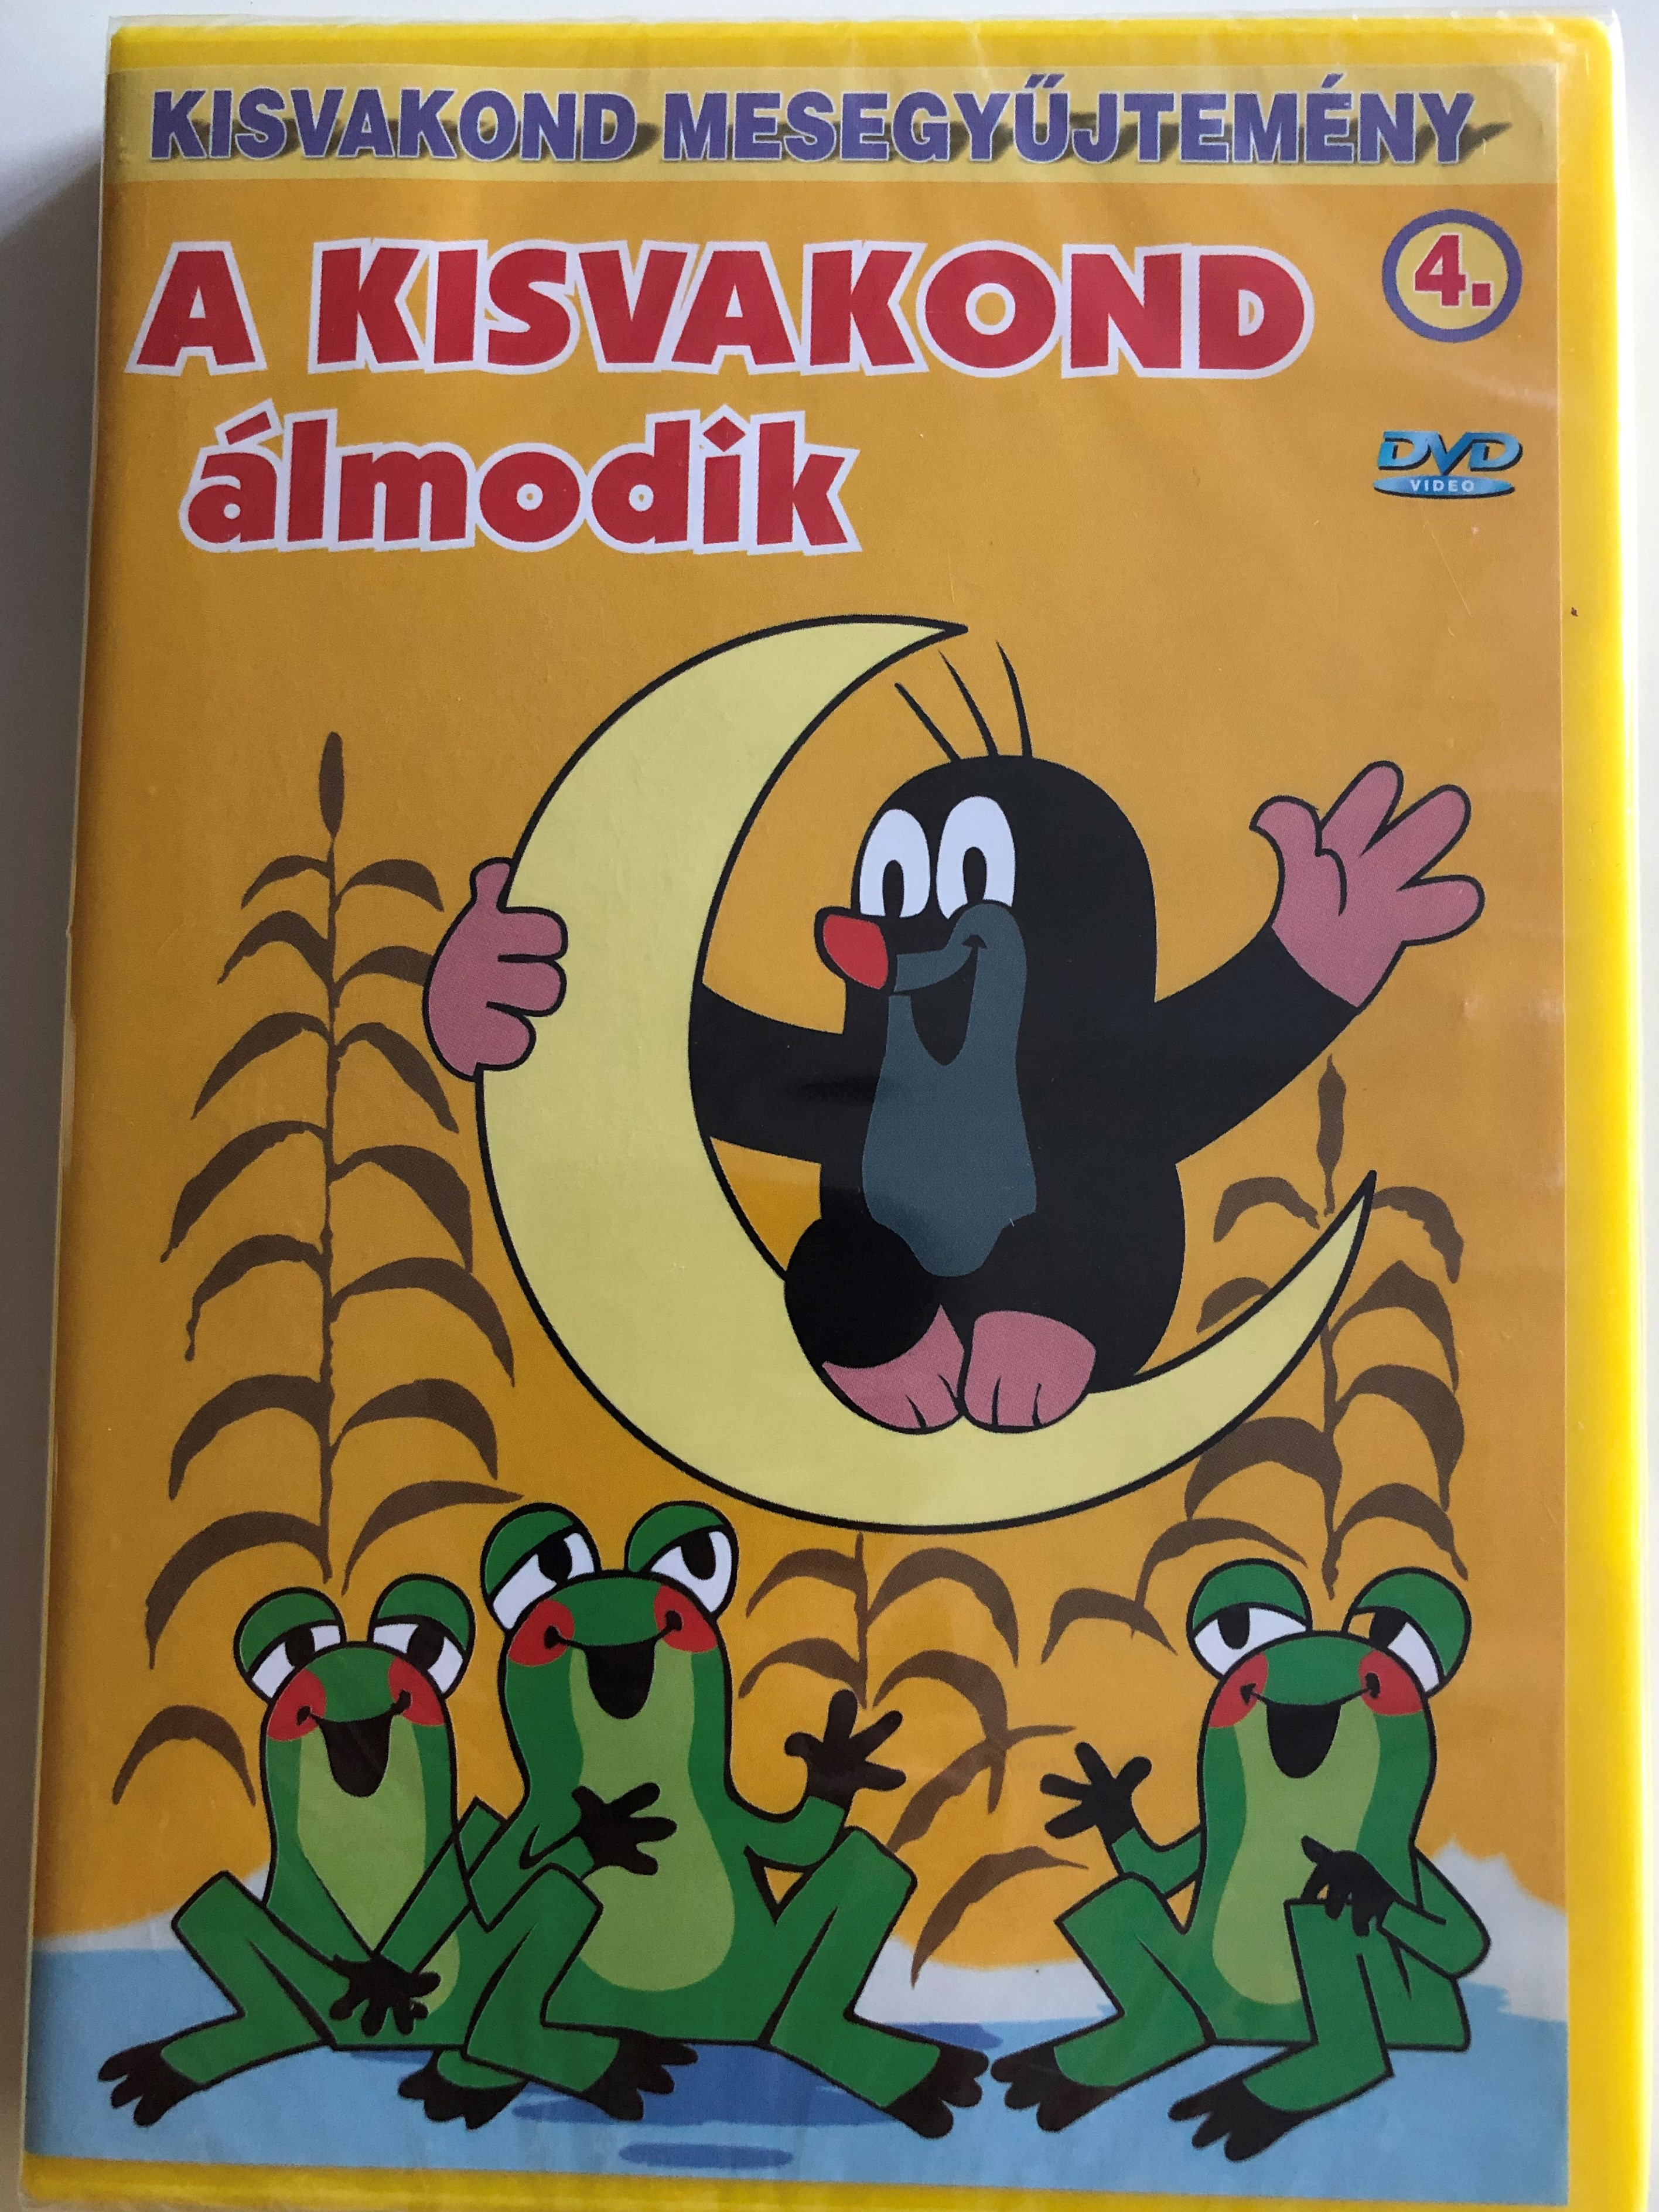 krtek-little-mole-is-dreaming-series-4.-dvd-2000-kisvakond-lmodik-kisvakond-mesegy-jtem-ny-4.-4-episodes-on-disc-classic-czech-cartoon-created-by-zden-k-miler-1-.jpg